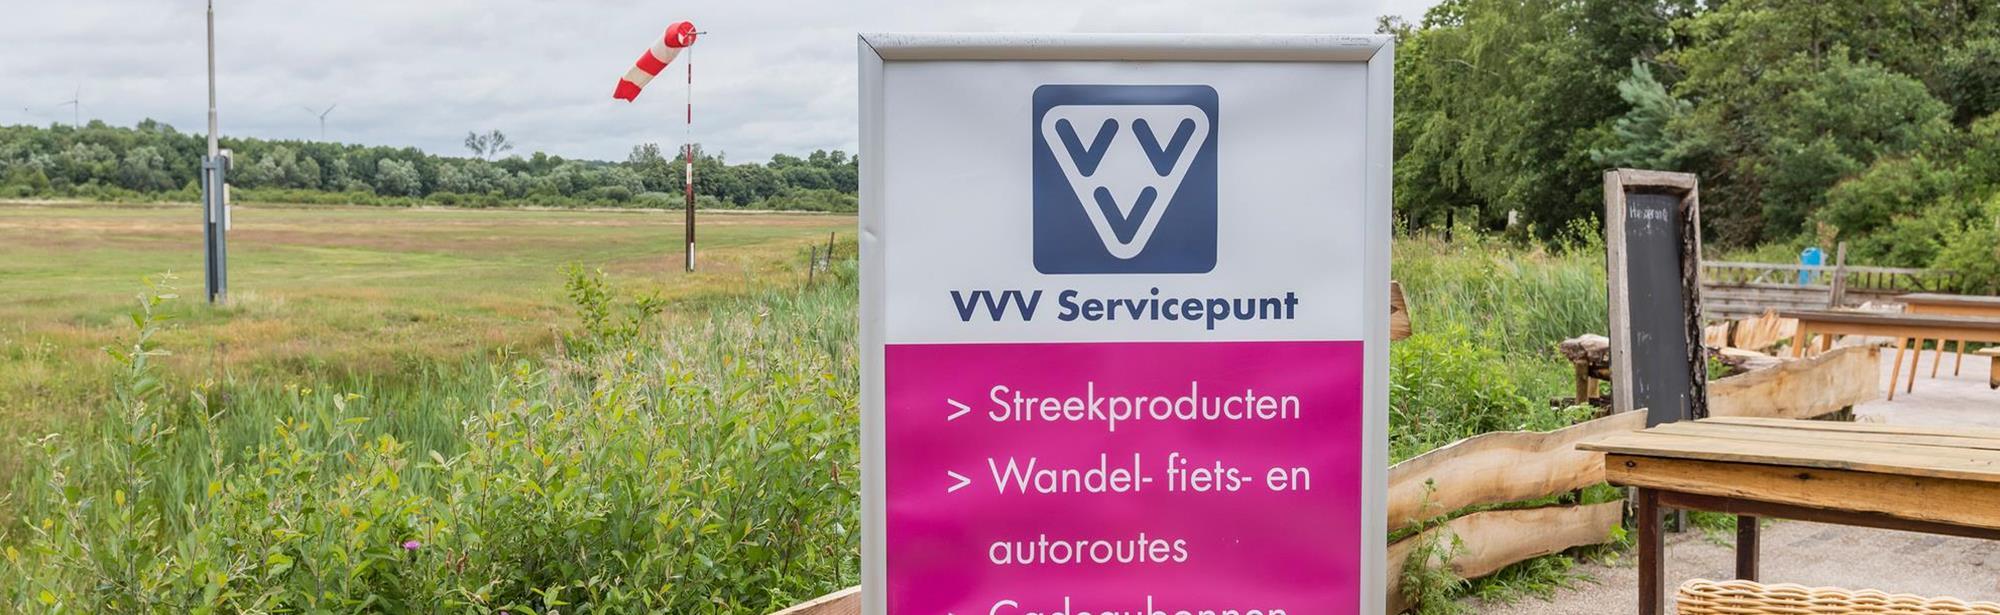 Visit Zuid-Limburg Servicepunt Restaurant de Lier